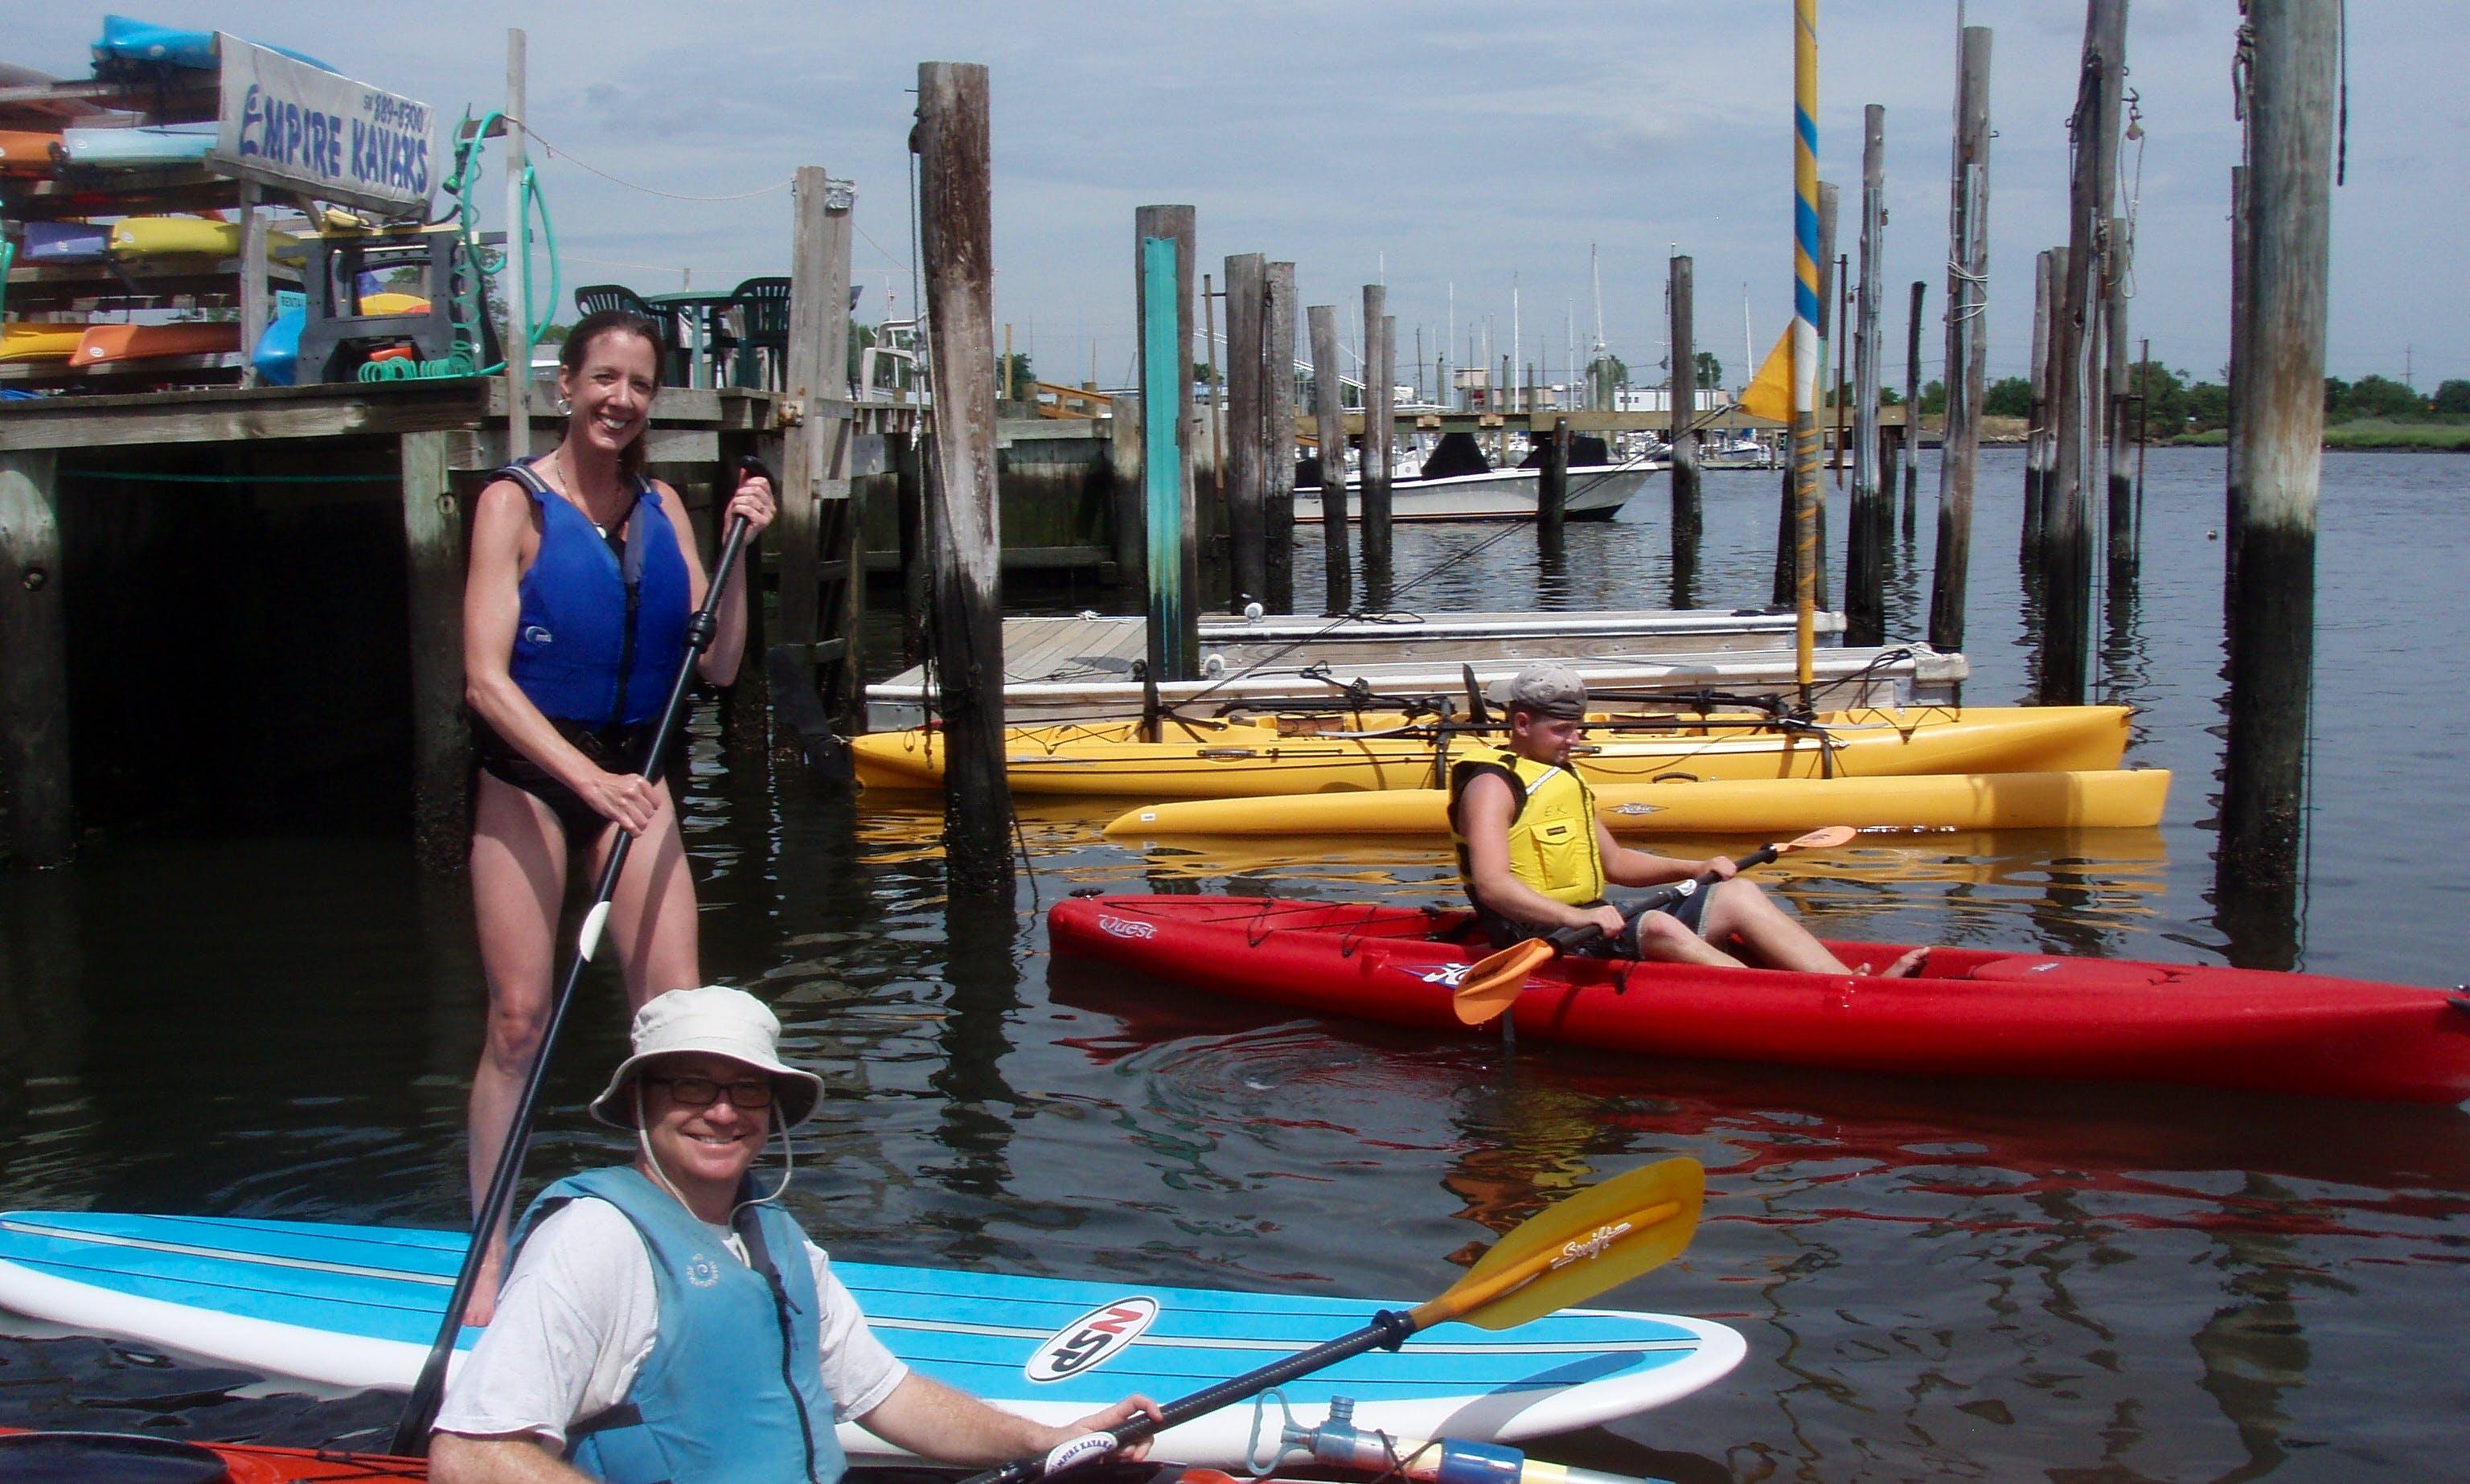 Kayak Rental in Island Park